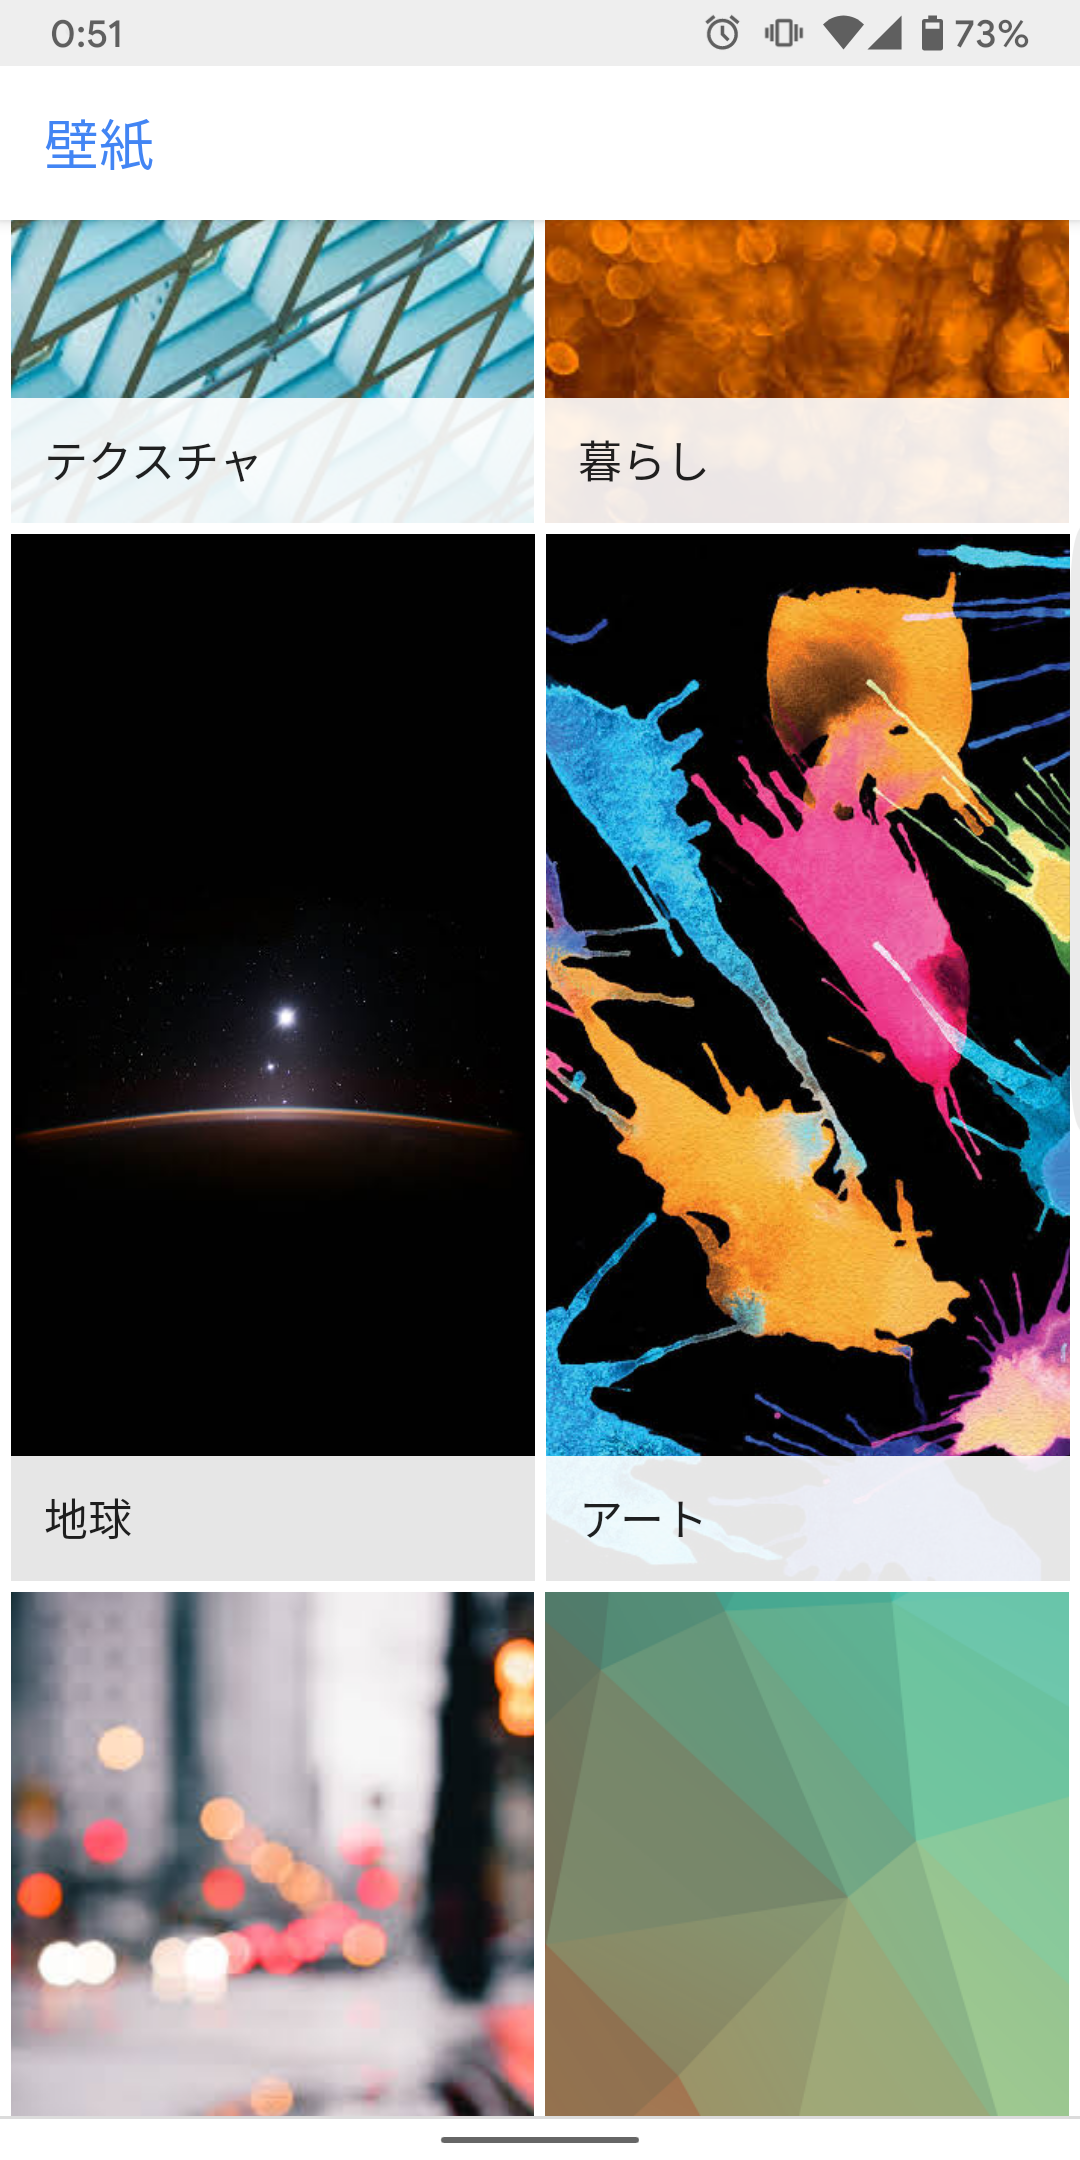 pixel3 ダウンロード